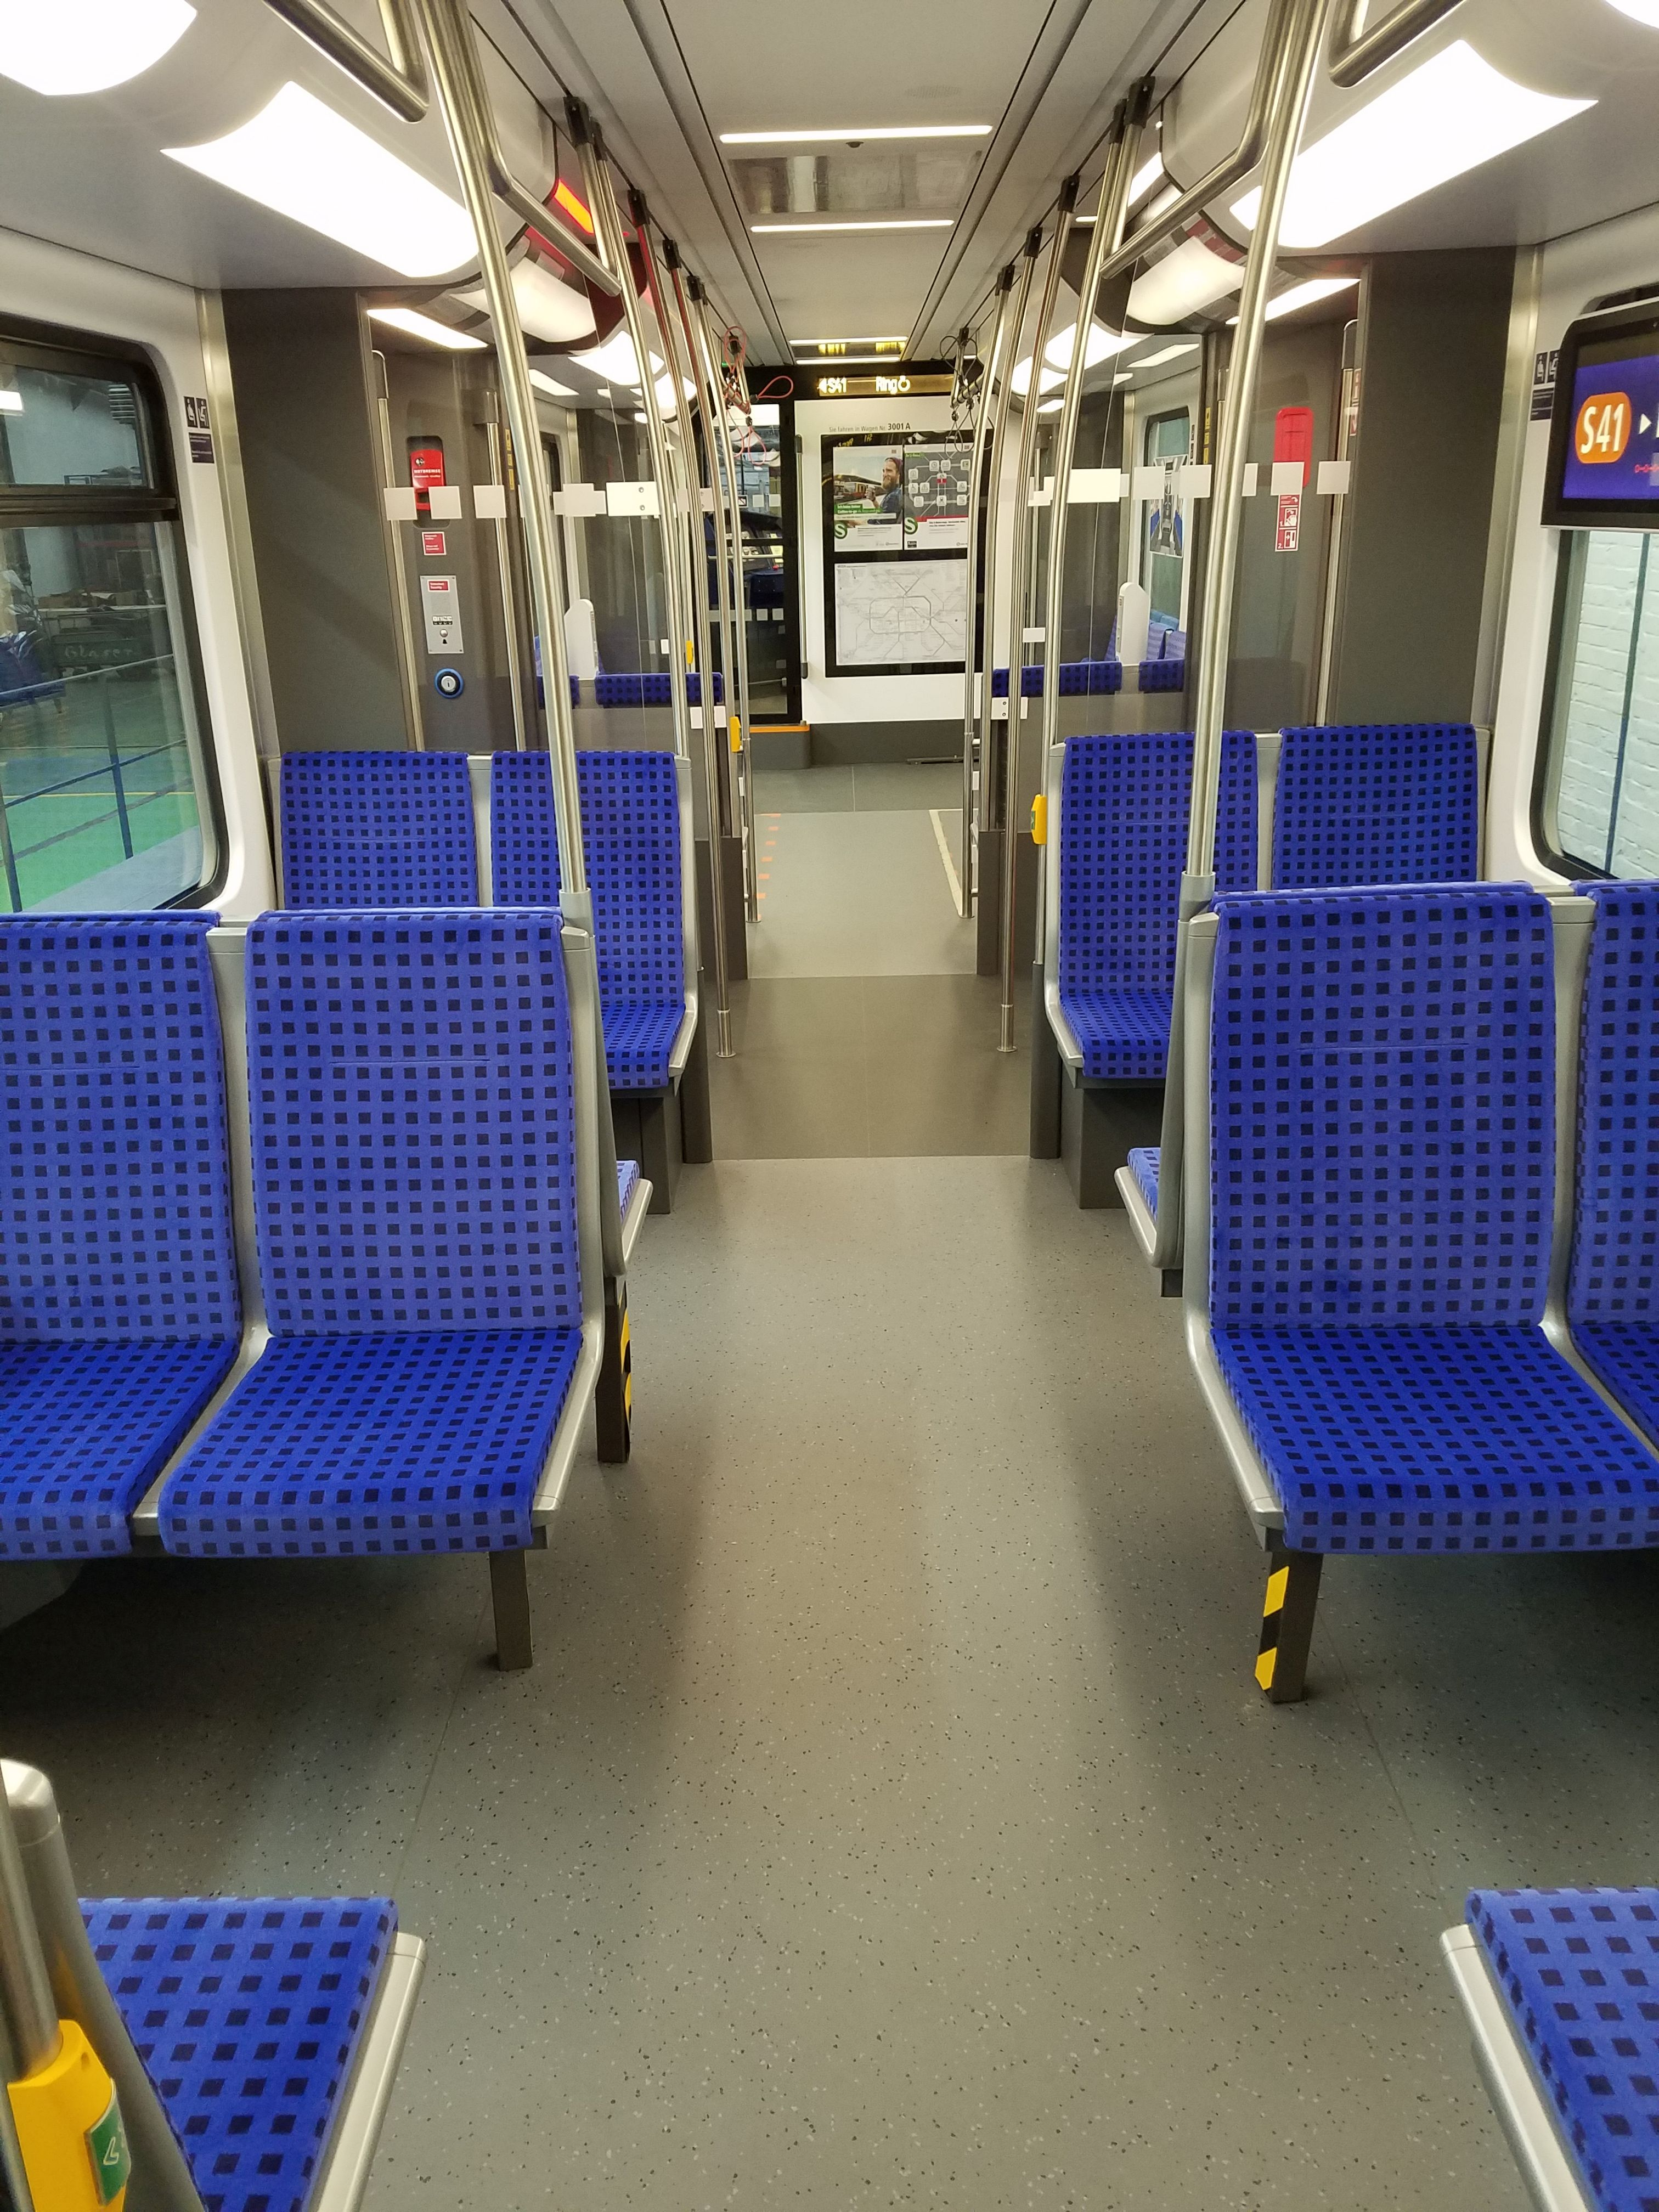 S-Bahn 483 Fahrgastraum